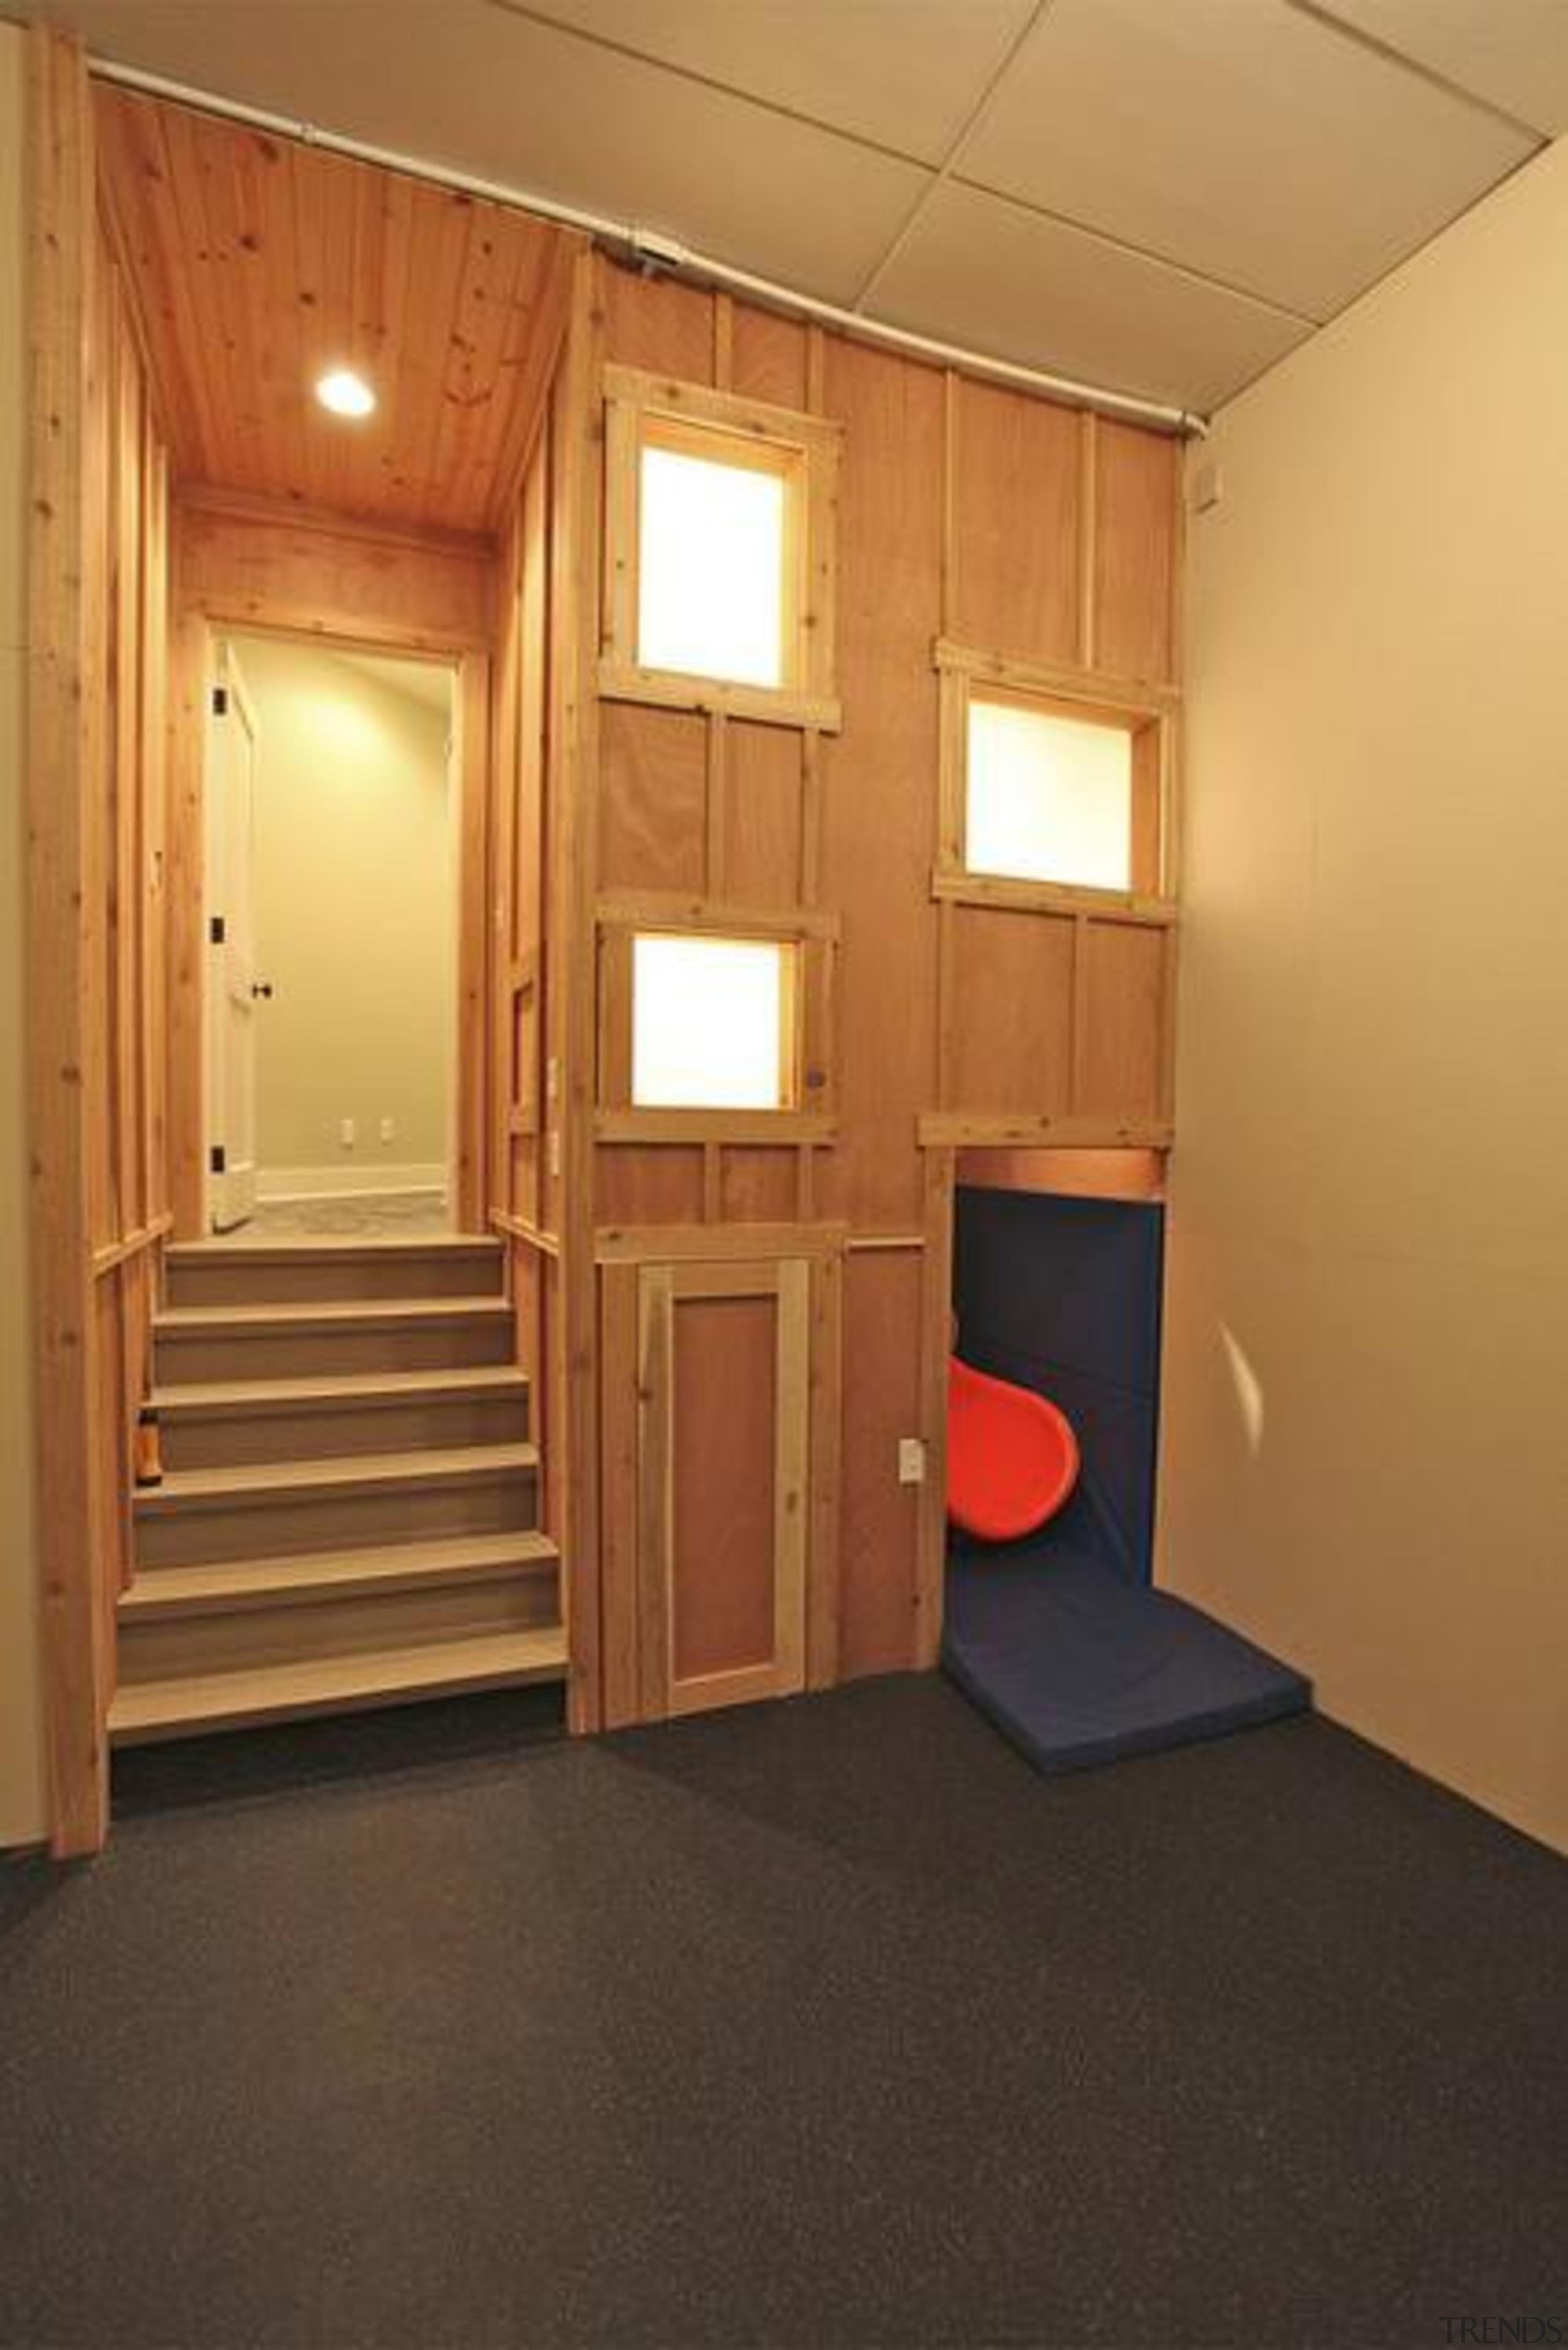 Created by Steve Kuhl of Kuhl Design Build, ceiling, door, floor, flooring, furniture, interior design, real estate, room, wall, wood, orange, brown